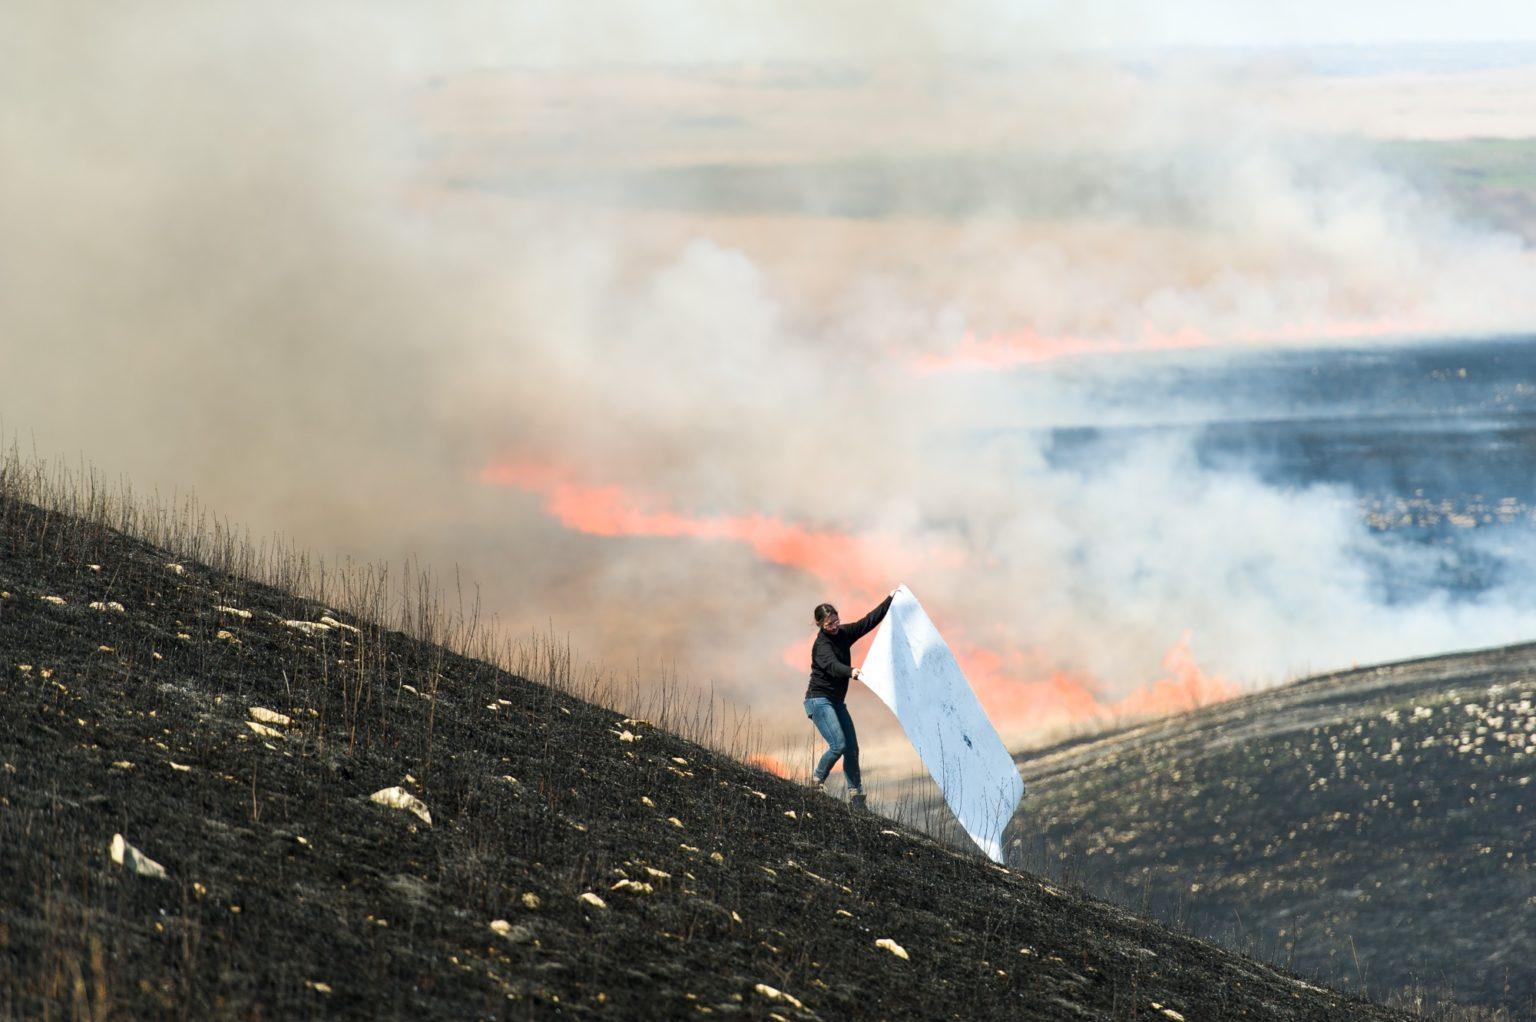 Artist Erin Wiersma creating charred biomass imprints during a controlled burn at Konza Prairie Station (KNZ).